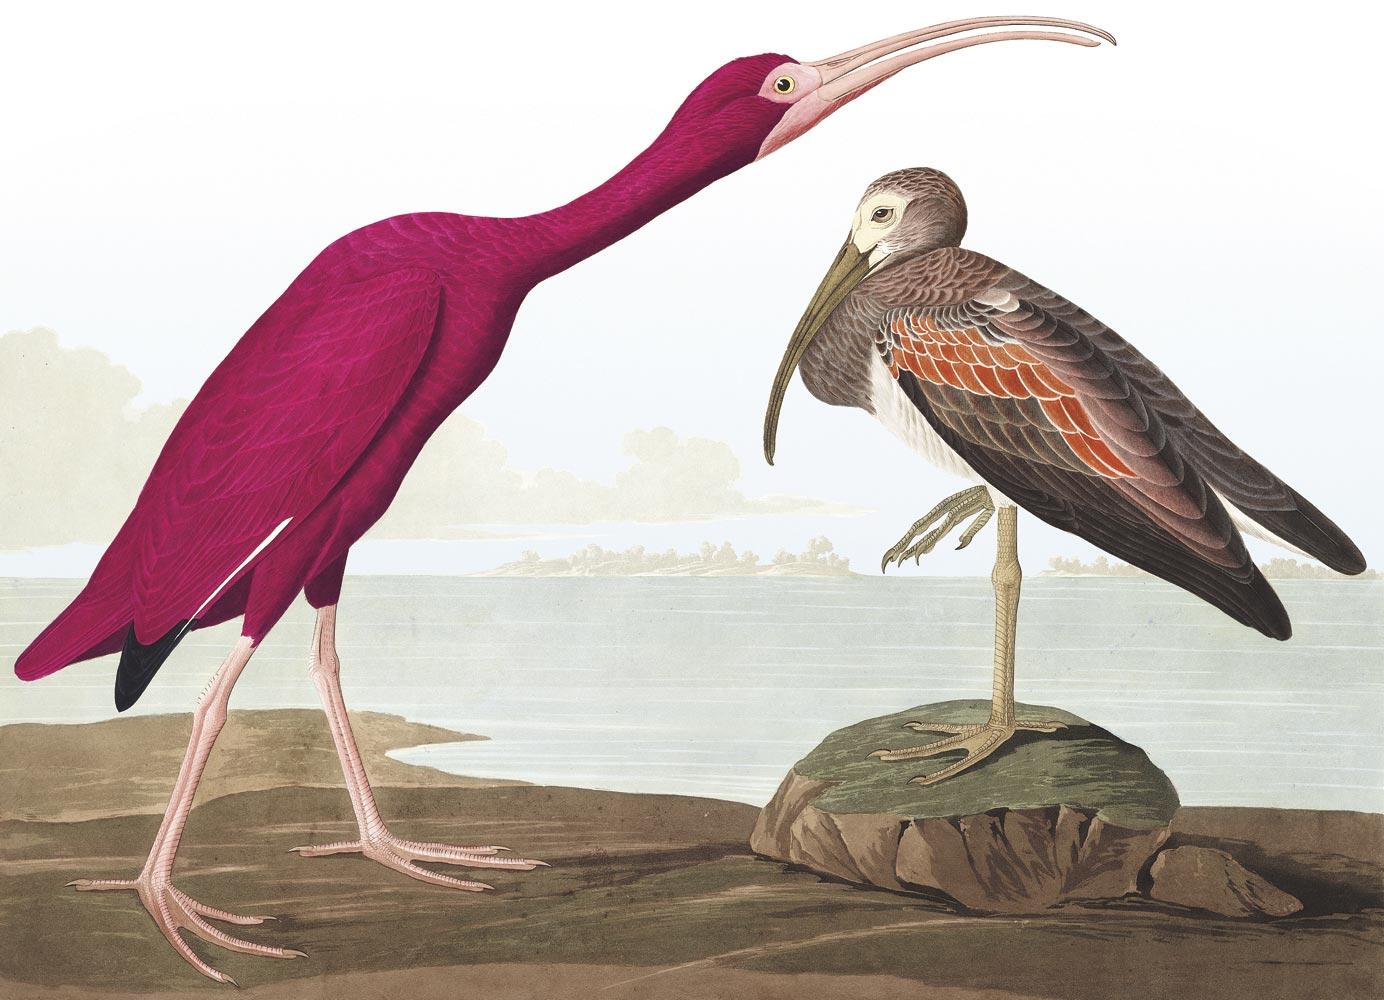 John James Audubon's Scarlet Ibis, from the landmark Birds of America. Courtesy The National Audubon Society